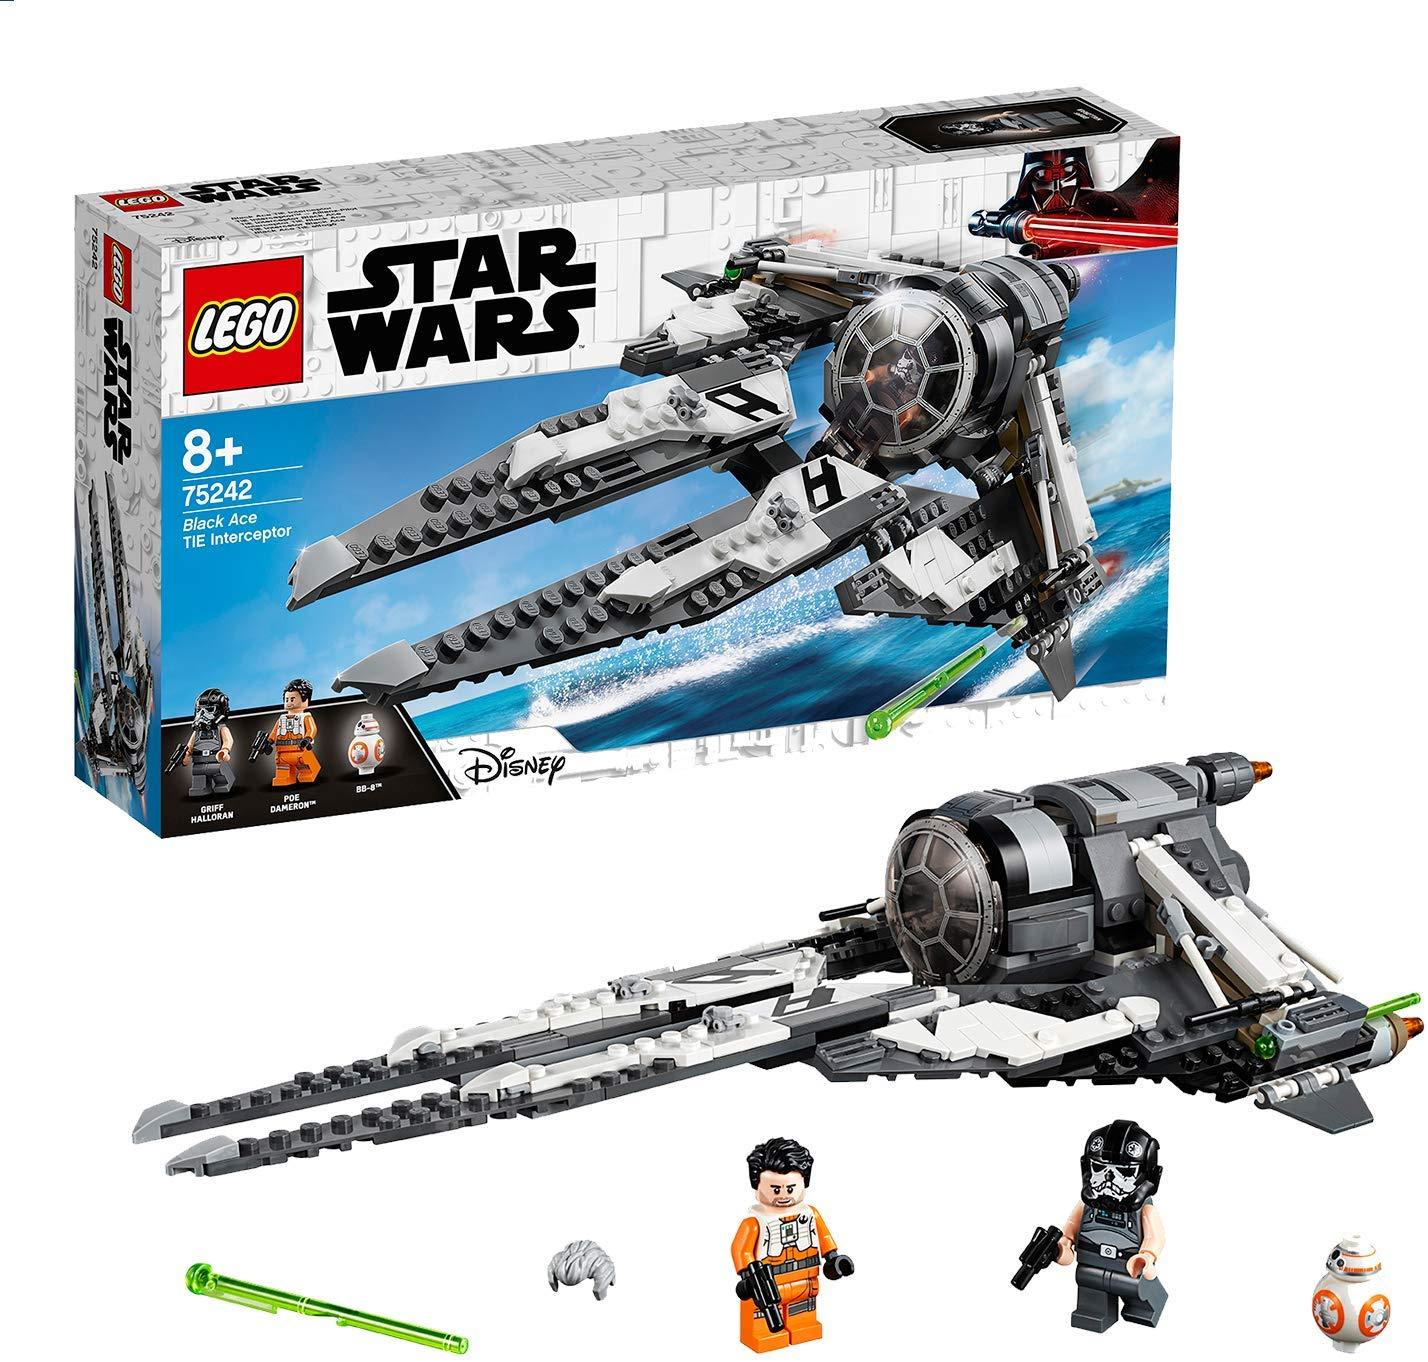 LEGO 75242 Star Wars Black Ace Tie Interceptor Starfighter Set Includes mini BB-8 and Poe Dameron Minifigures £22.49 @ Amazon